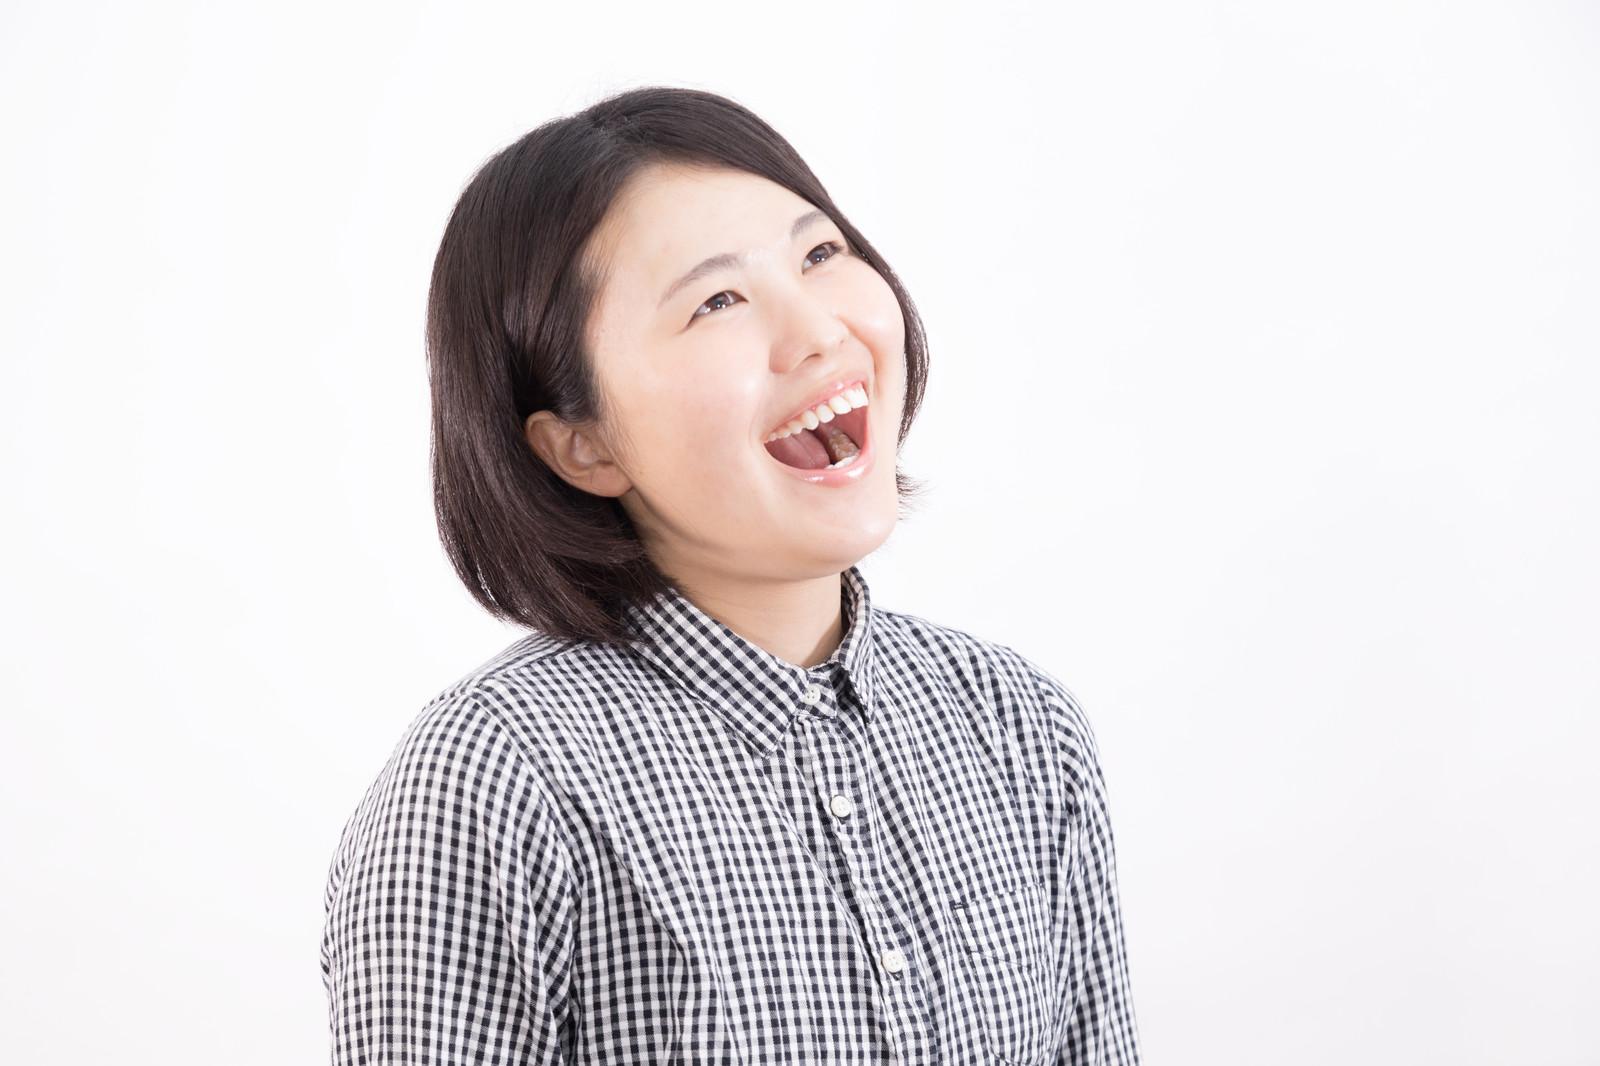 新垣結衣 芸人T 誰 ツネ 画像